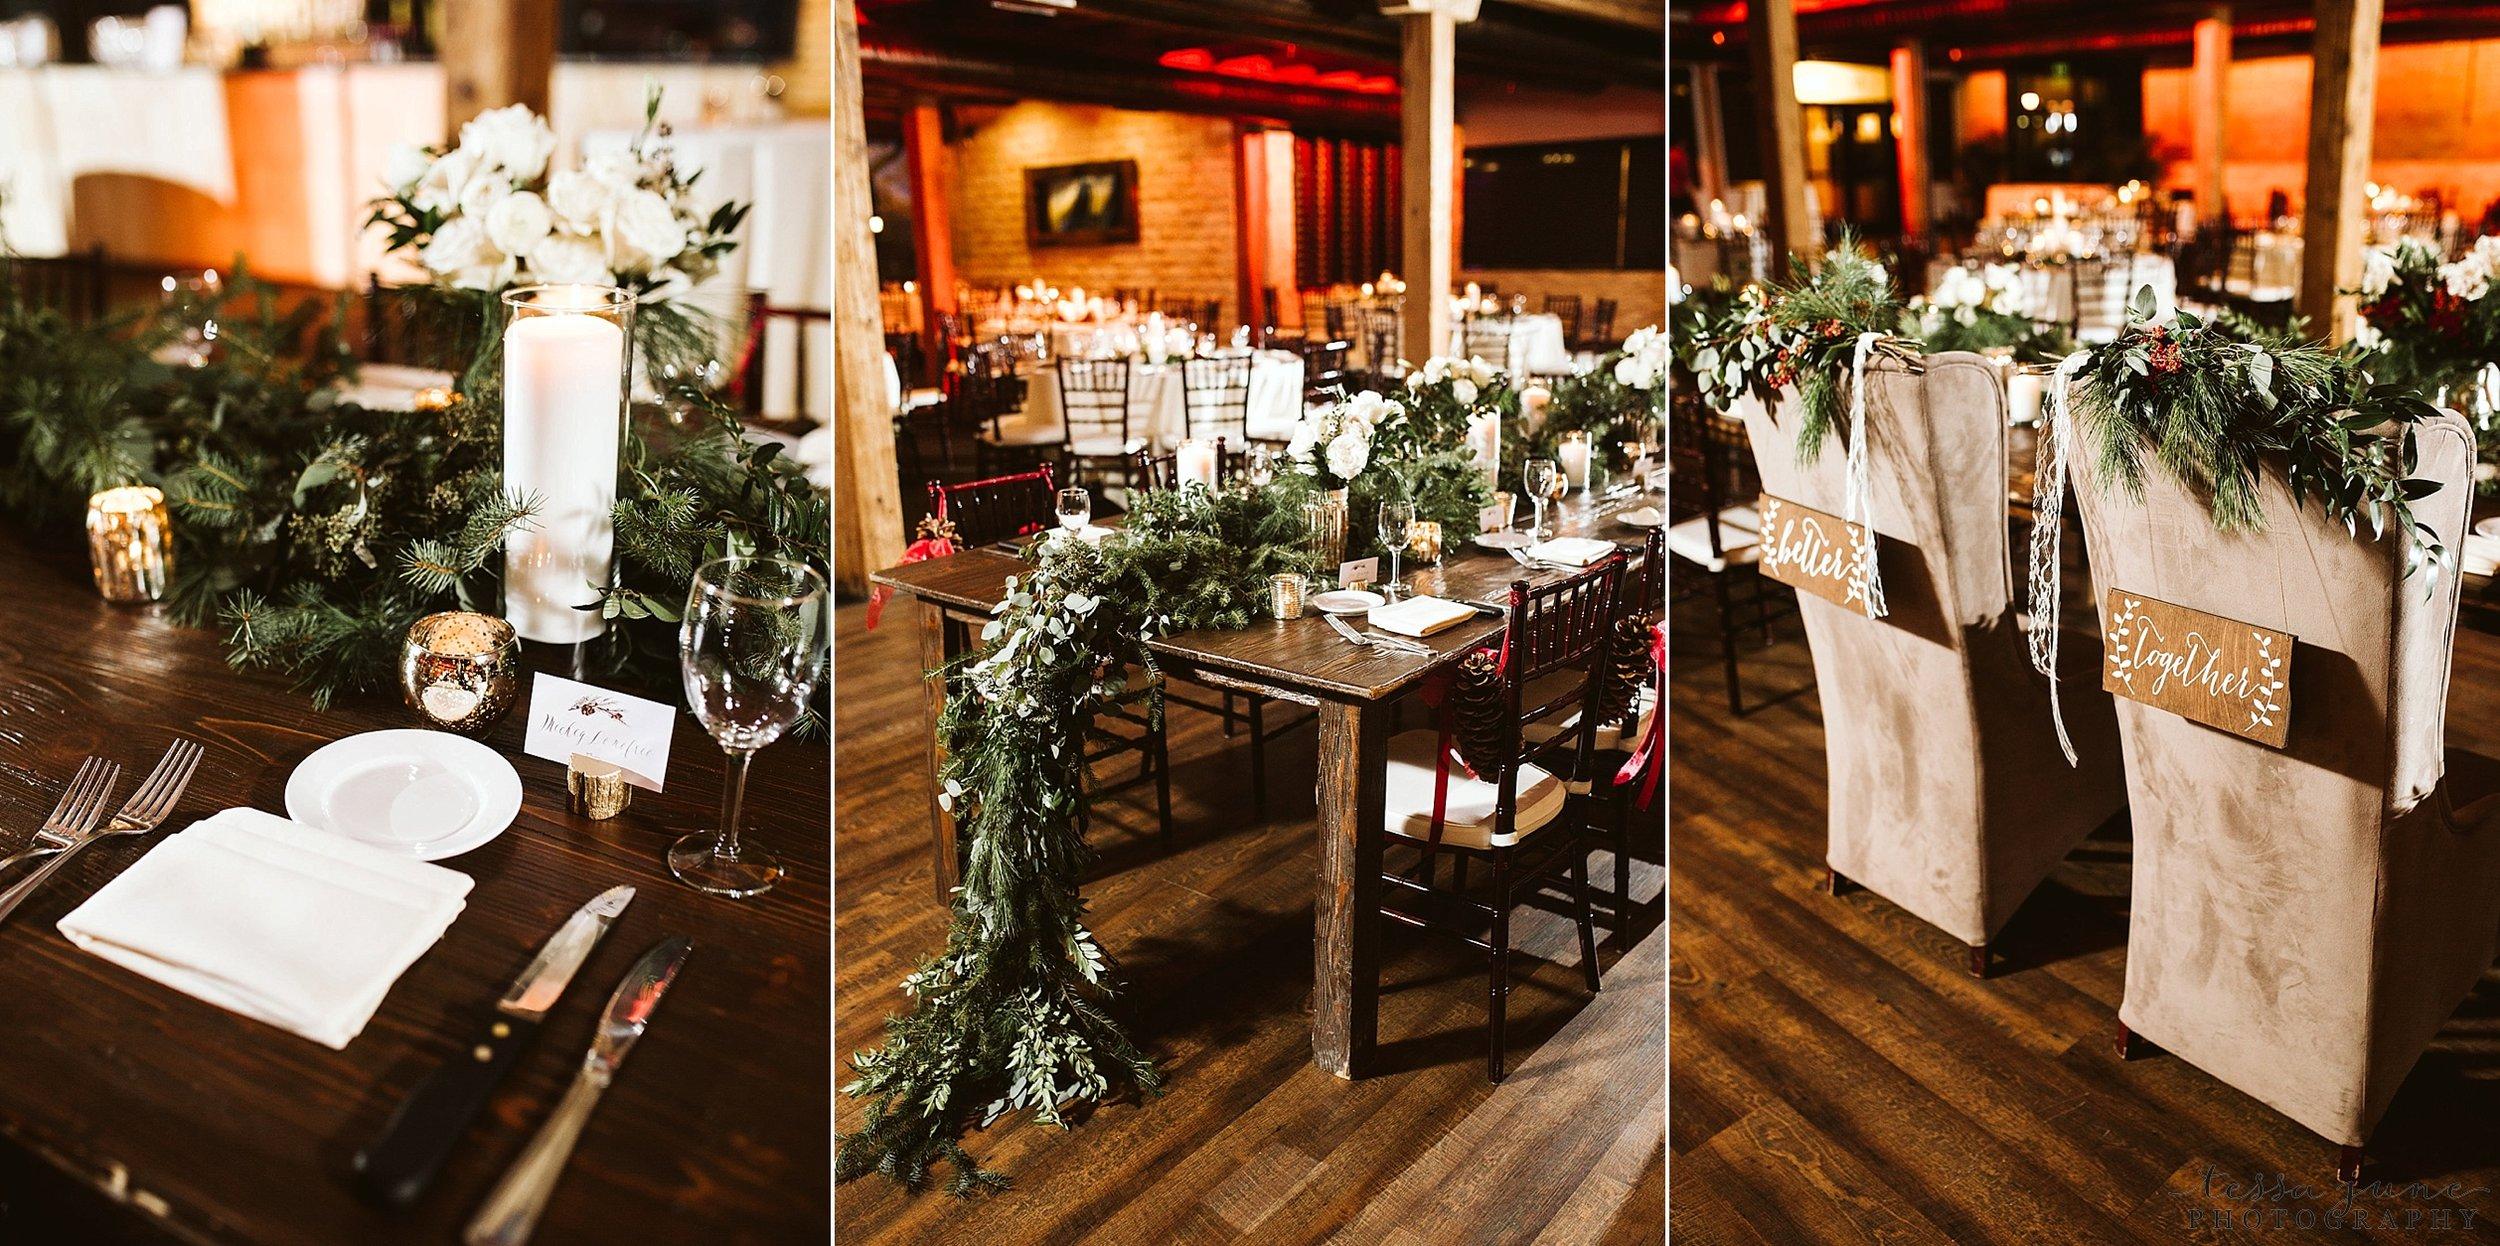 minneapolis-event-center-winter-romantic-snow-wedding-december-165.jpg